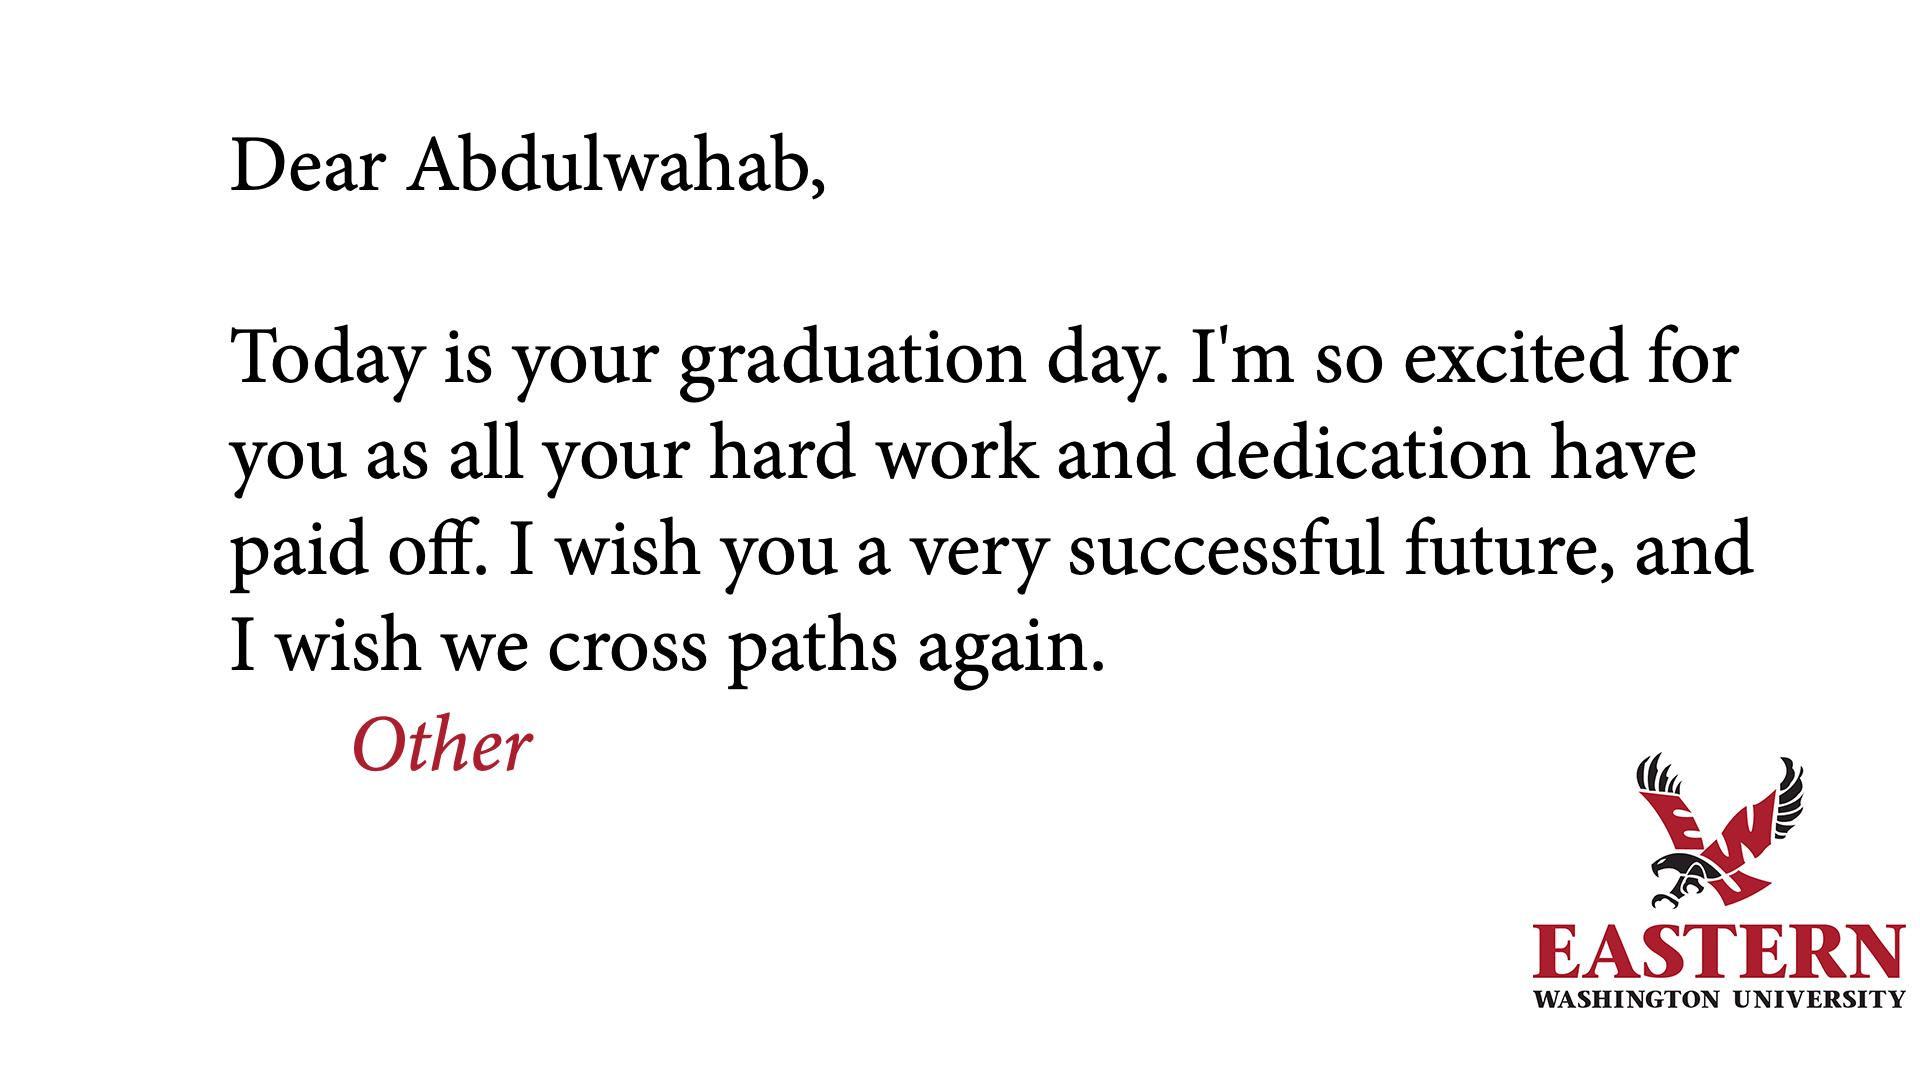 tbi_abdulwahab-ali-a-alanazi_8318.png